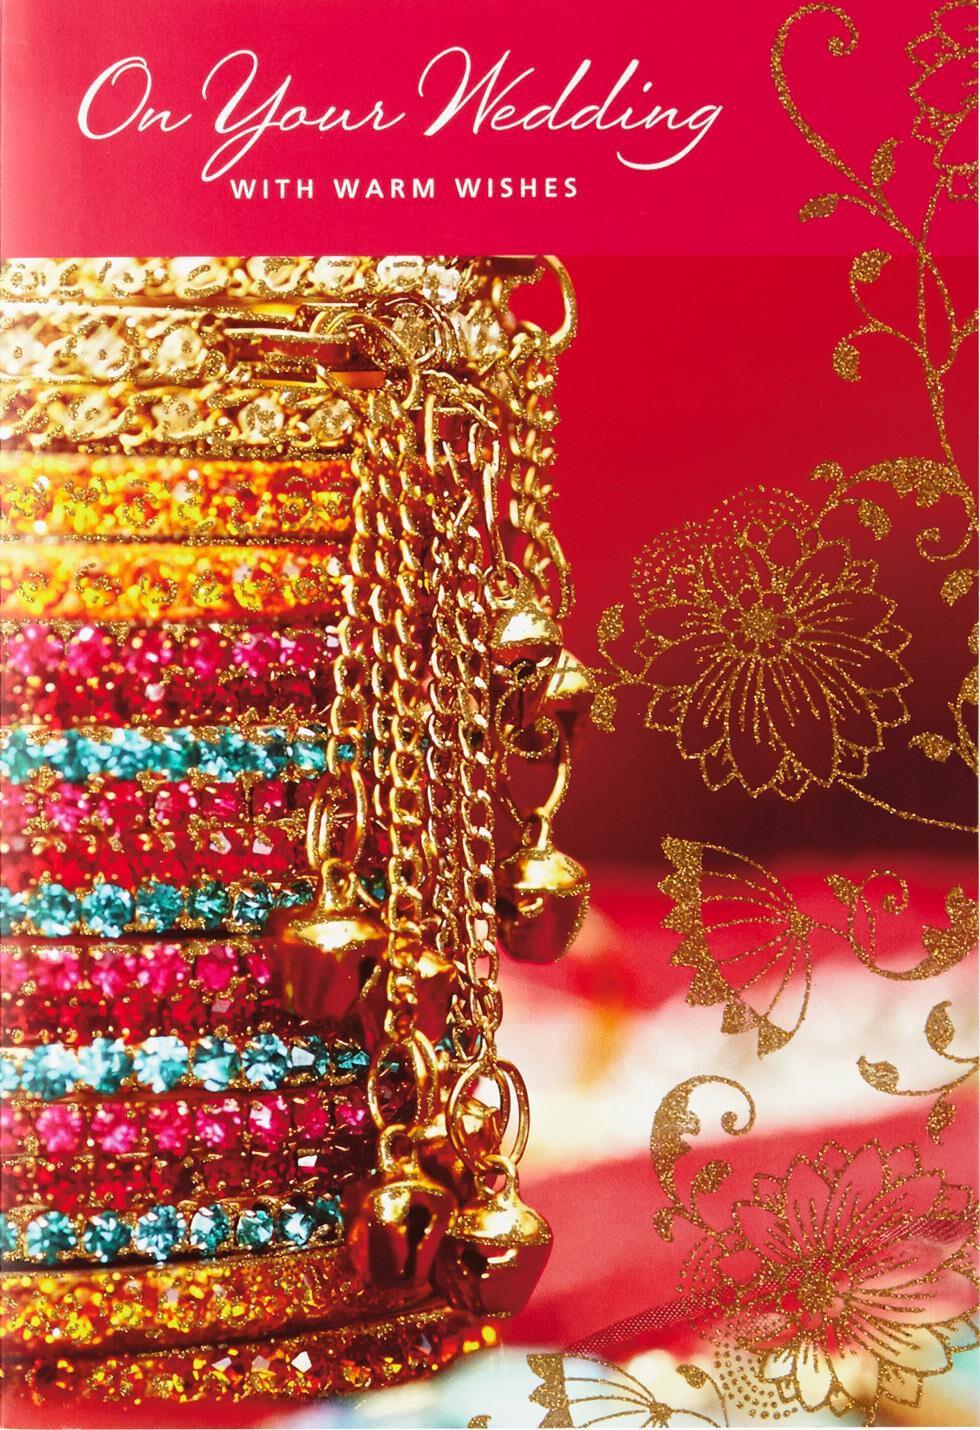 Warm Wishes Wedding Card Greeting Cards Hallmark